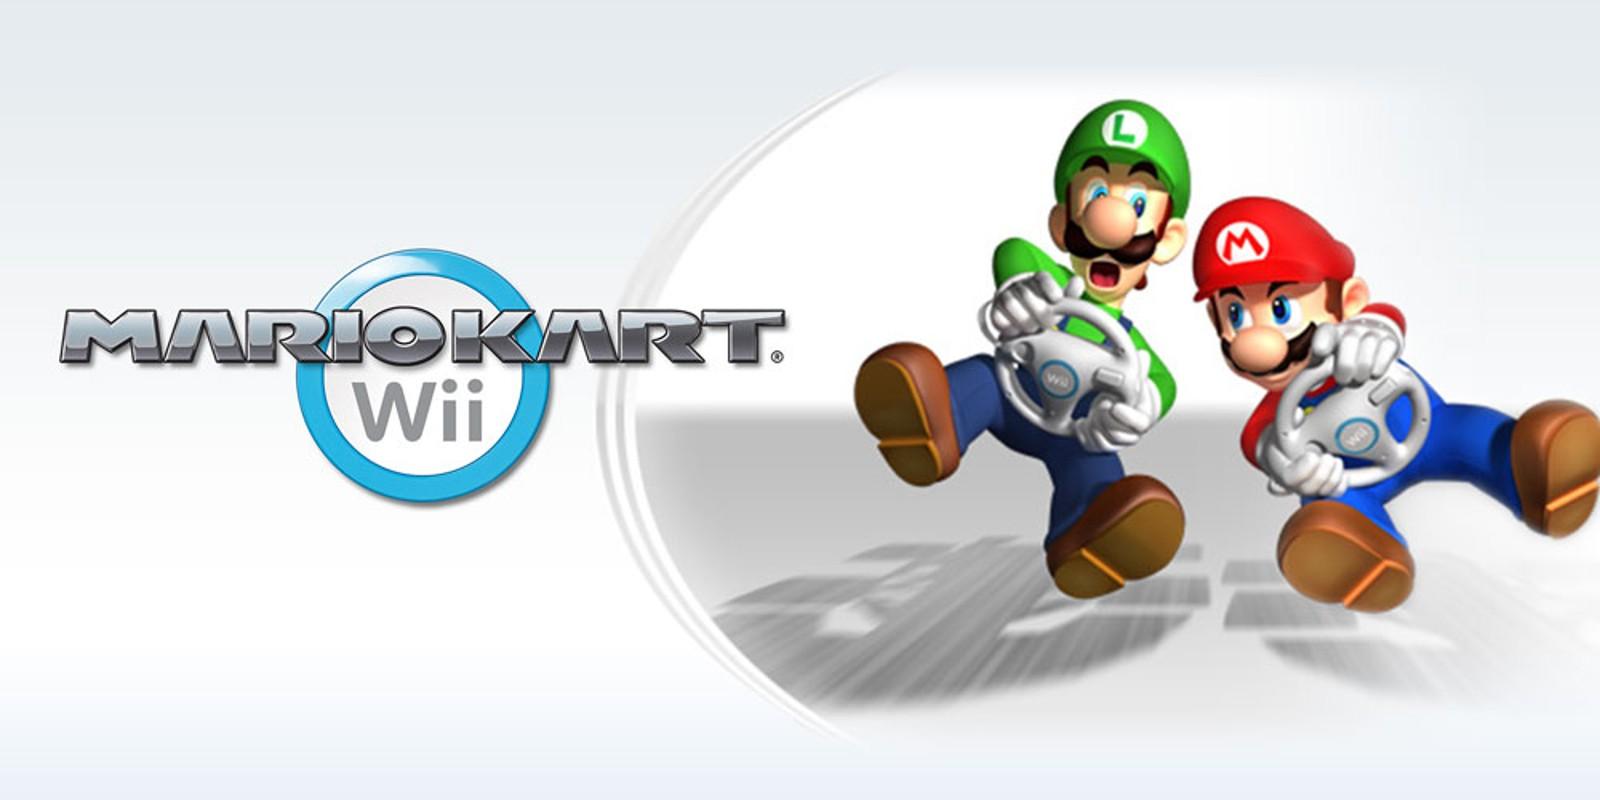 SI_Wii_MarioKartWii_image1600w.jpg